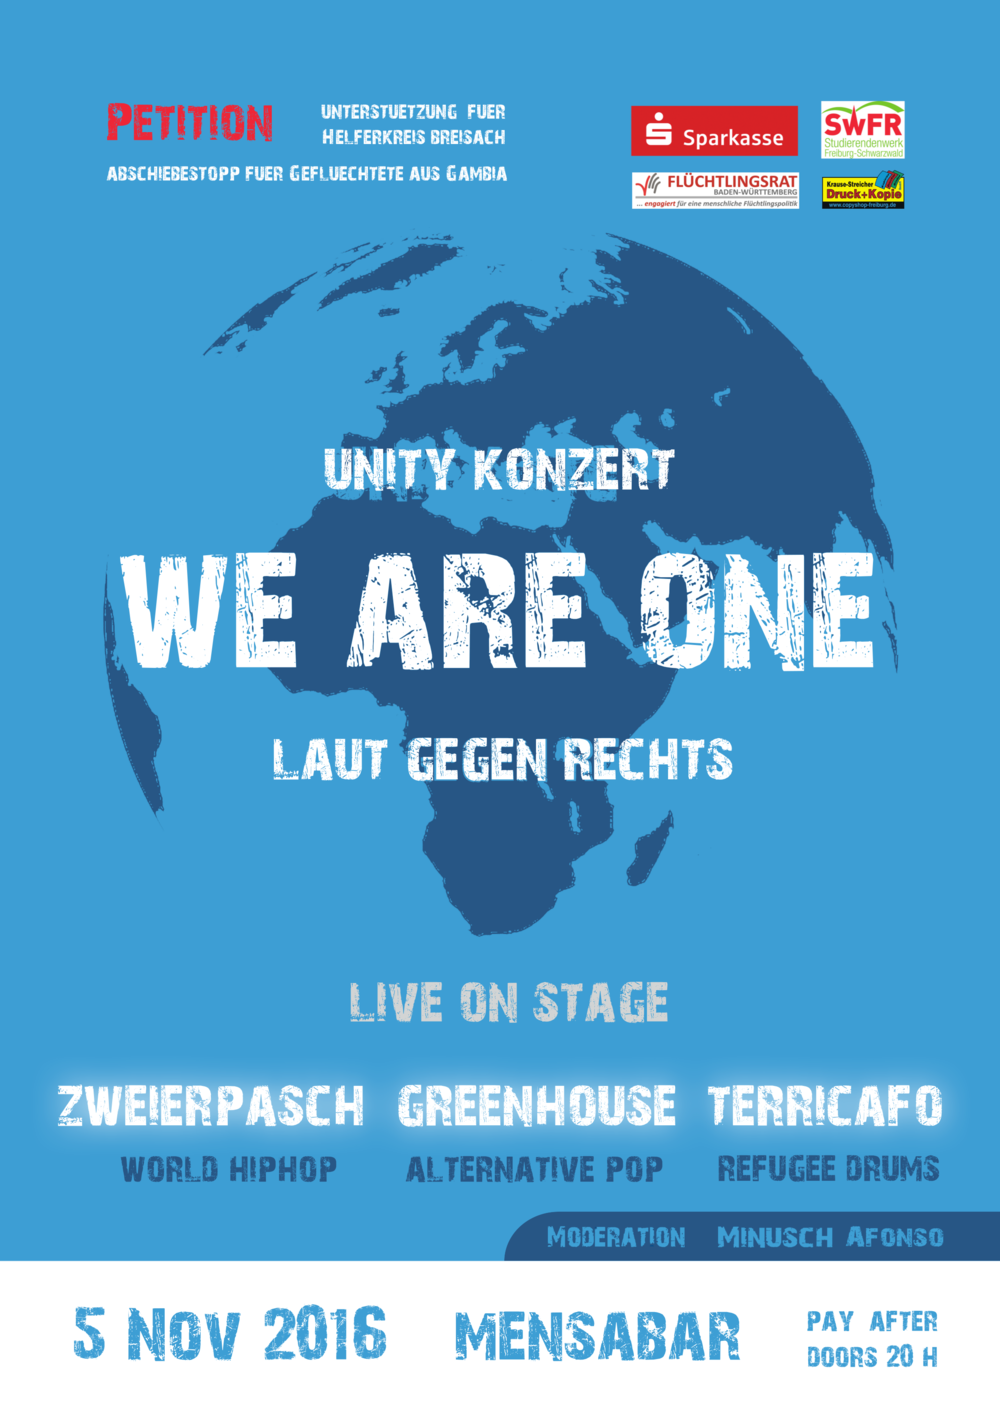 We are One - Laut gegen rechts - Unity Konzert mit Zweierpasch, Greenhouse, Terricafó